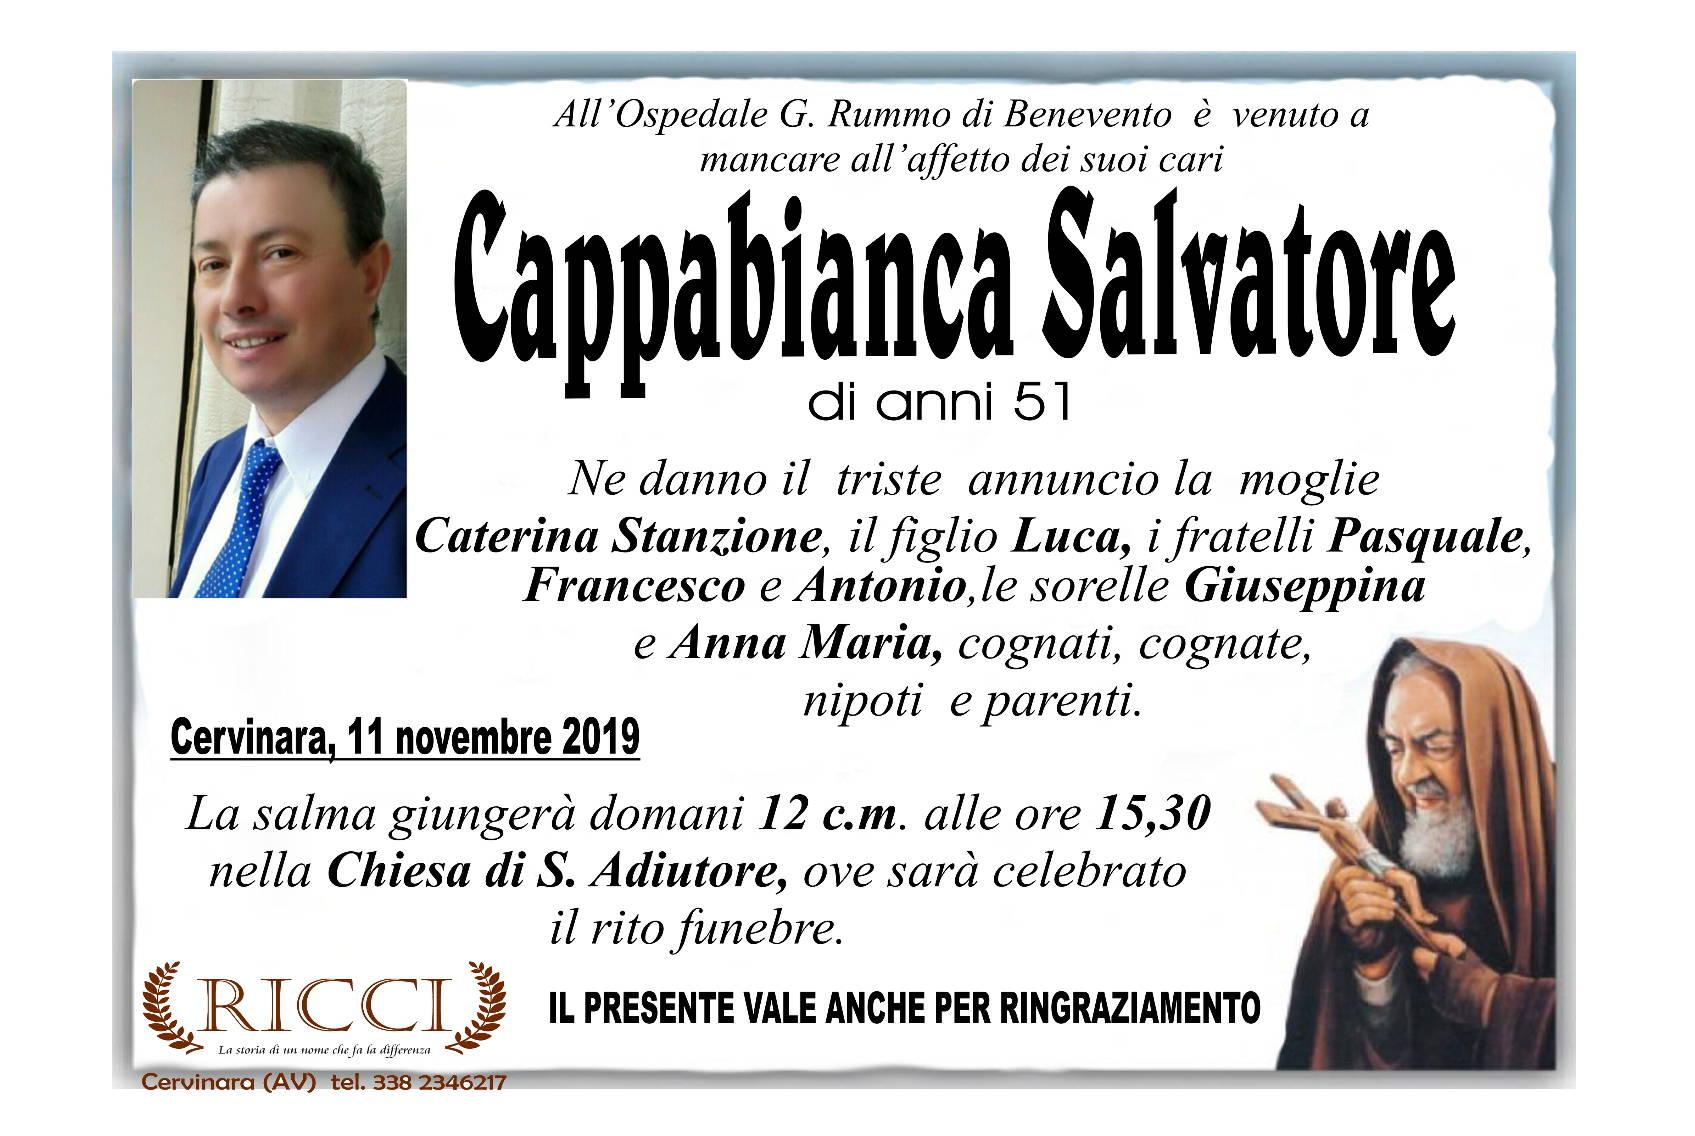 Salvatore Cappabianca